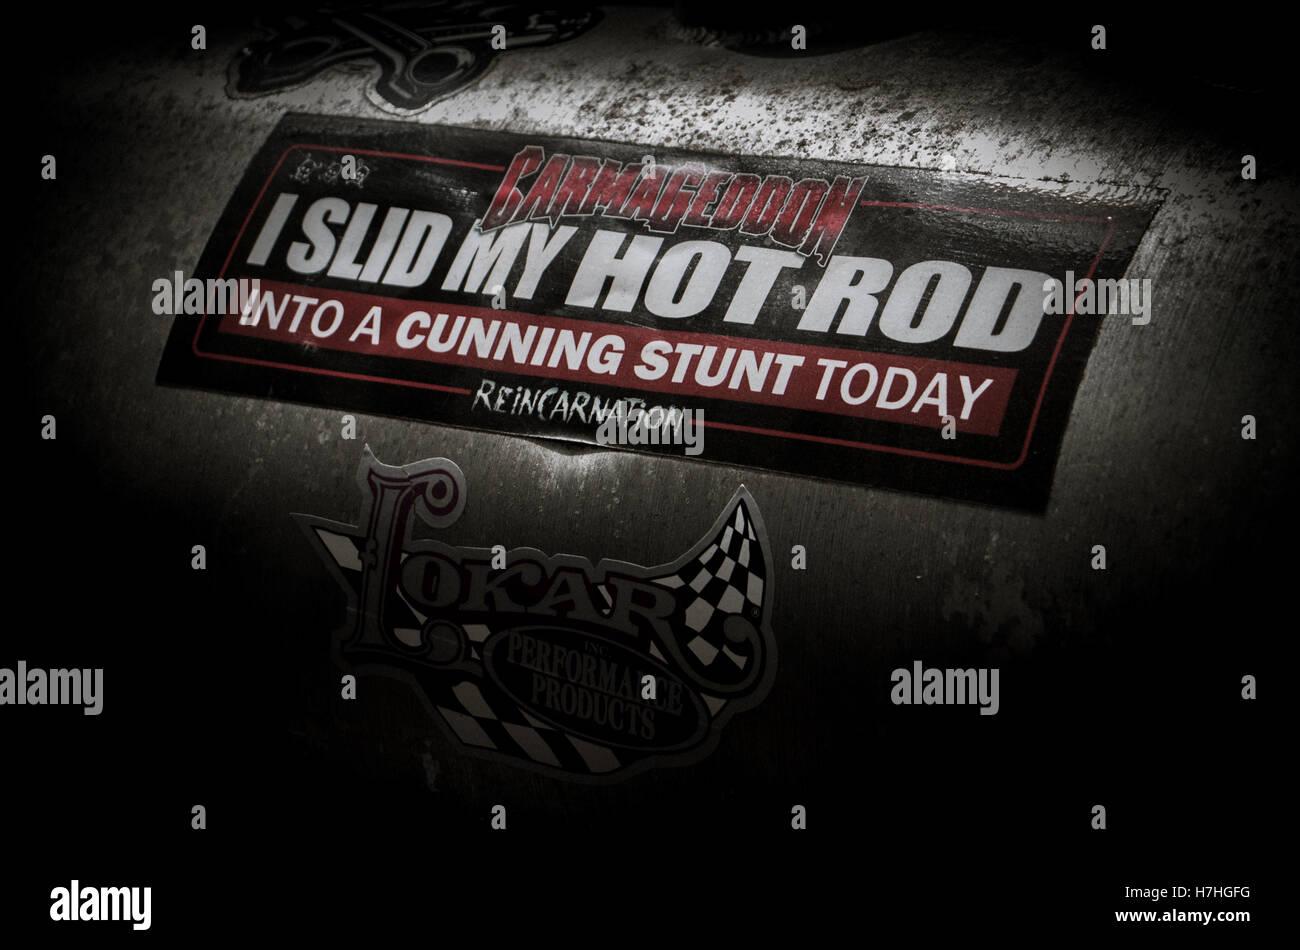 Cunning Stunts Photo Stock